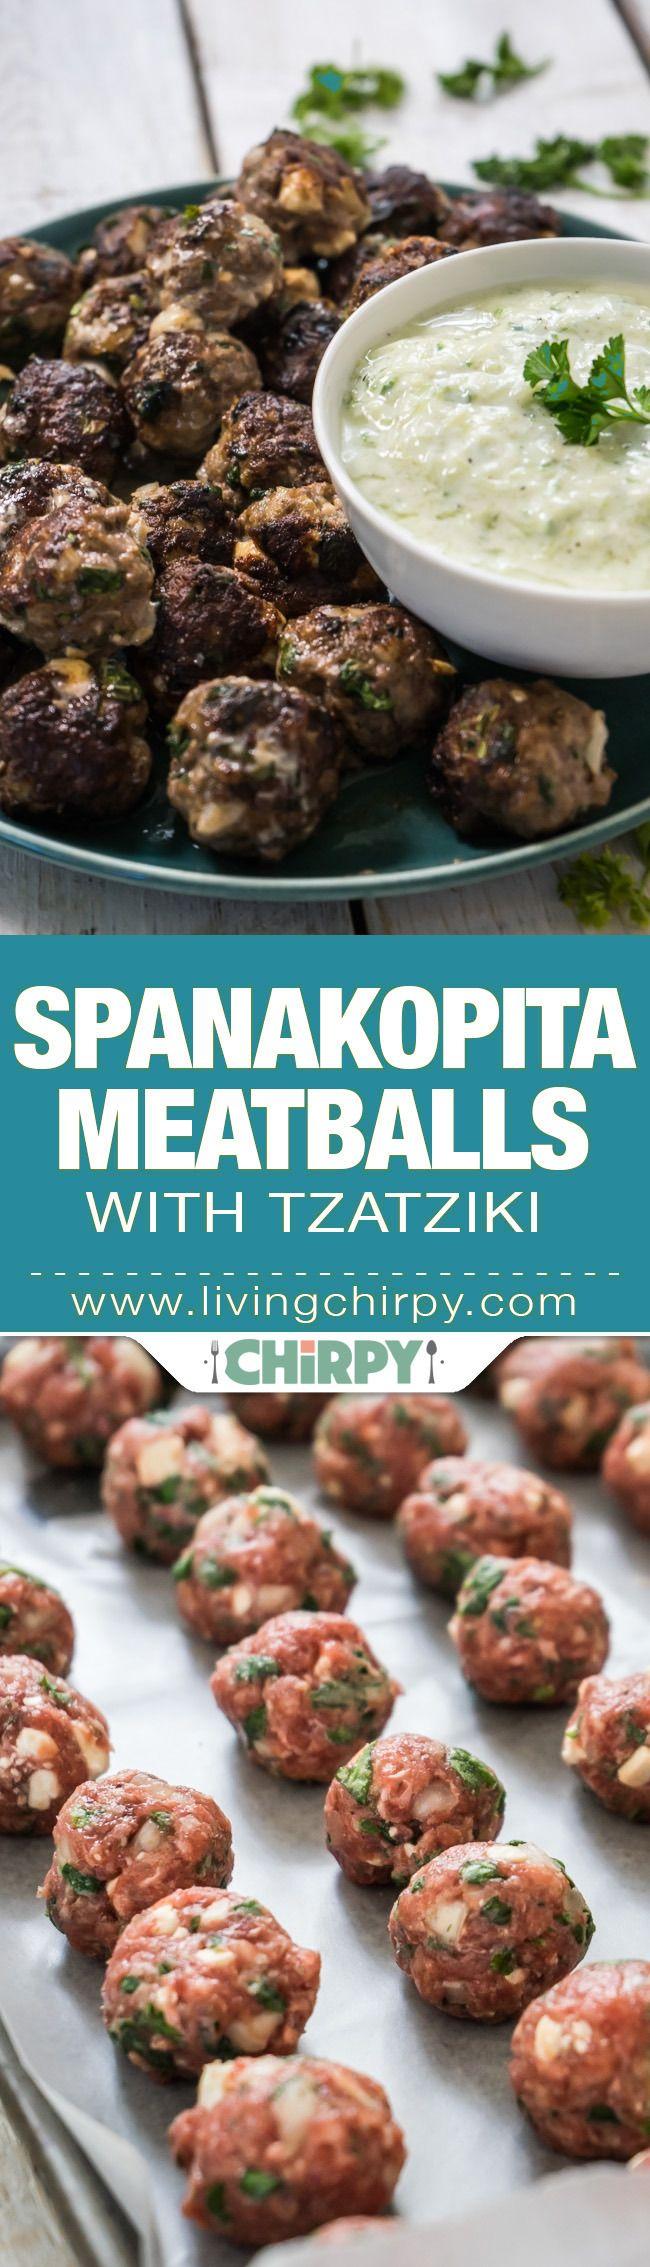 Spanakopita Meatballs. Love child of Kleftedes and Spanakopita. Meatballs filled with spinach and creamy feta cheese. Served with Tzatziki.